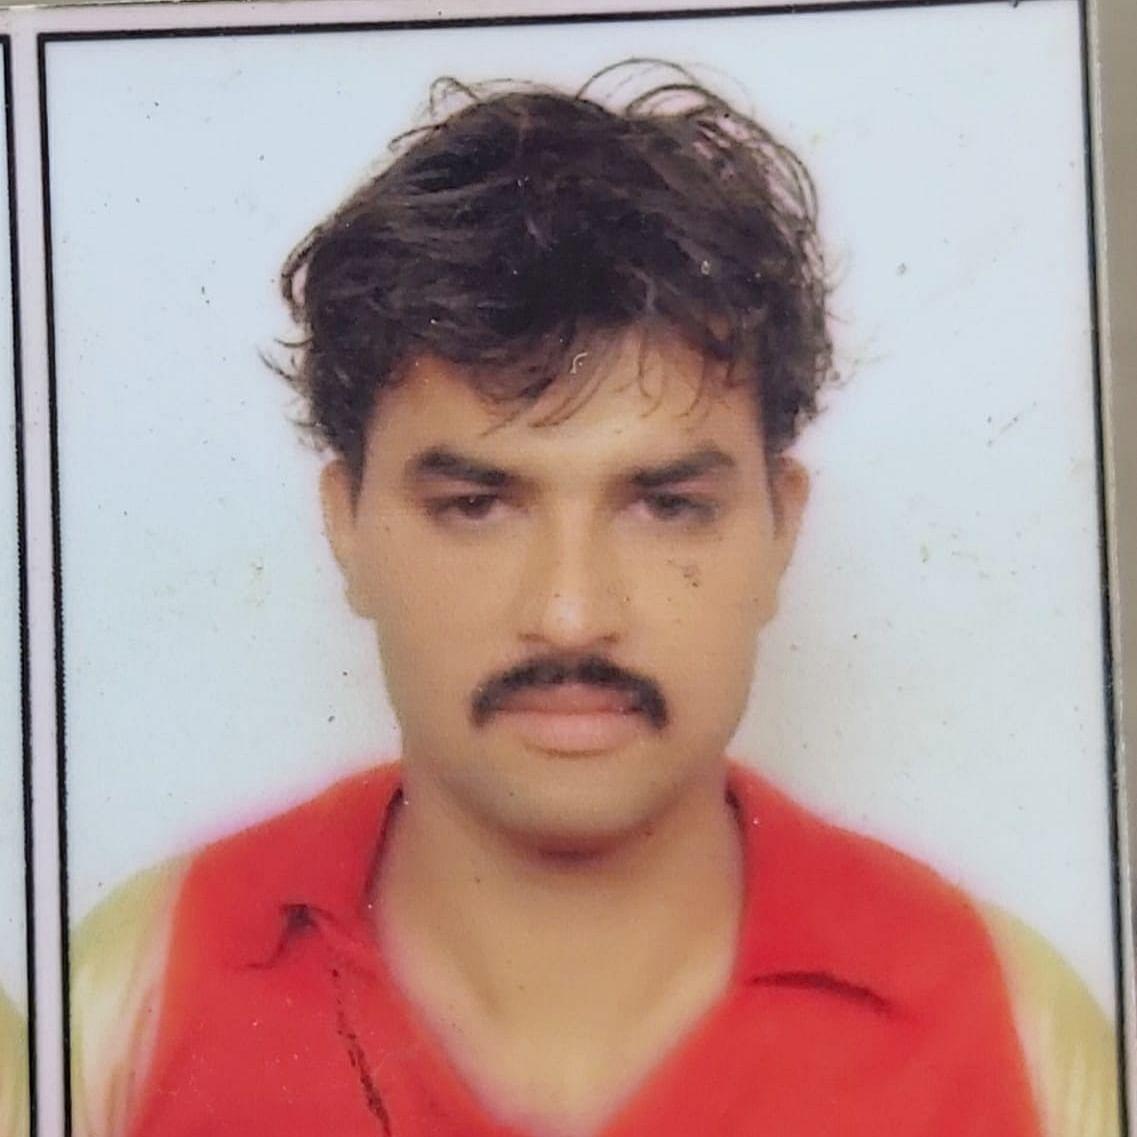 Indore: Missing man found murdered near liquor shop in Sirpur